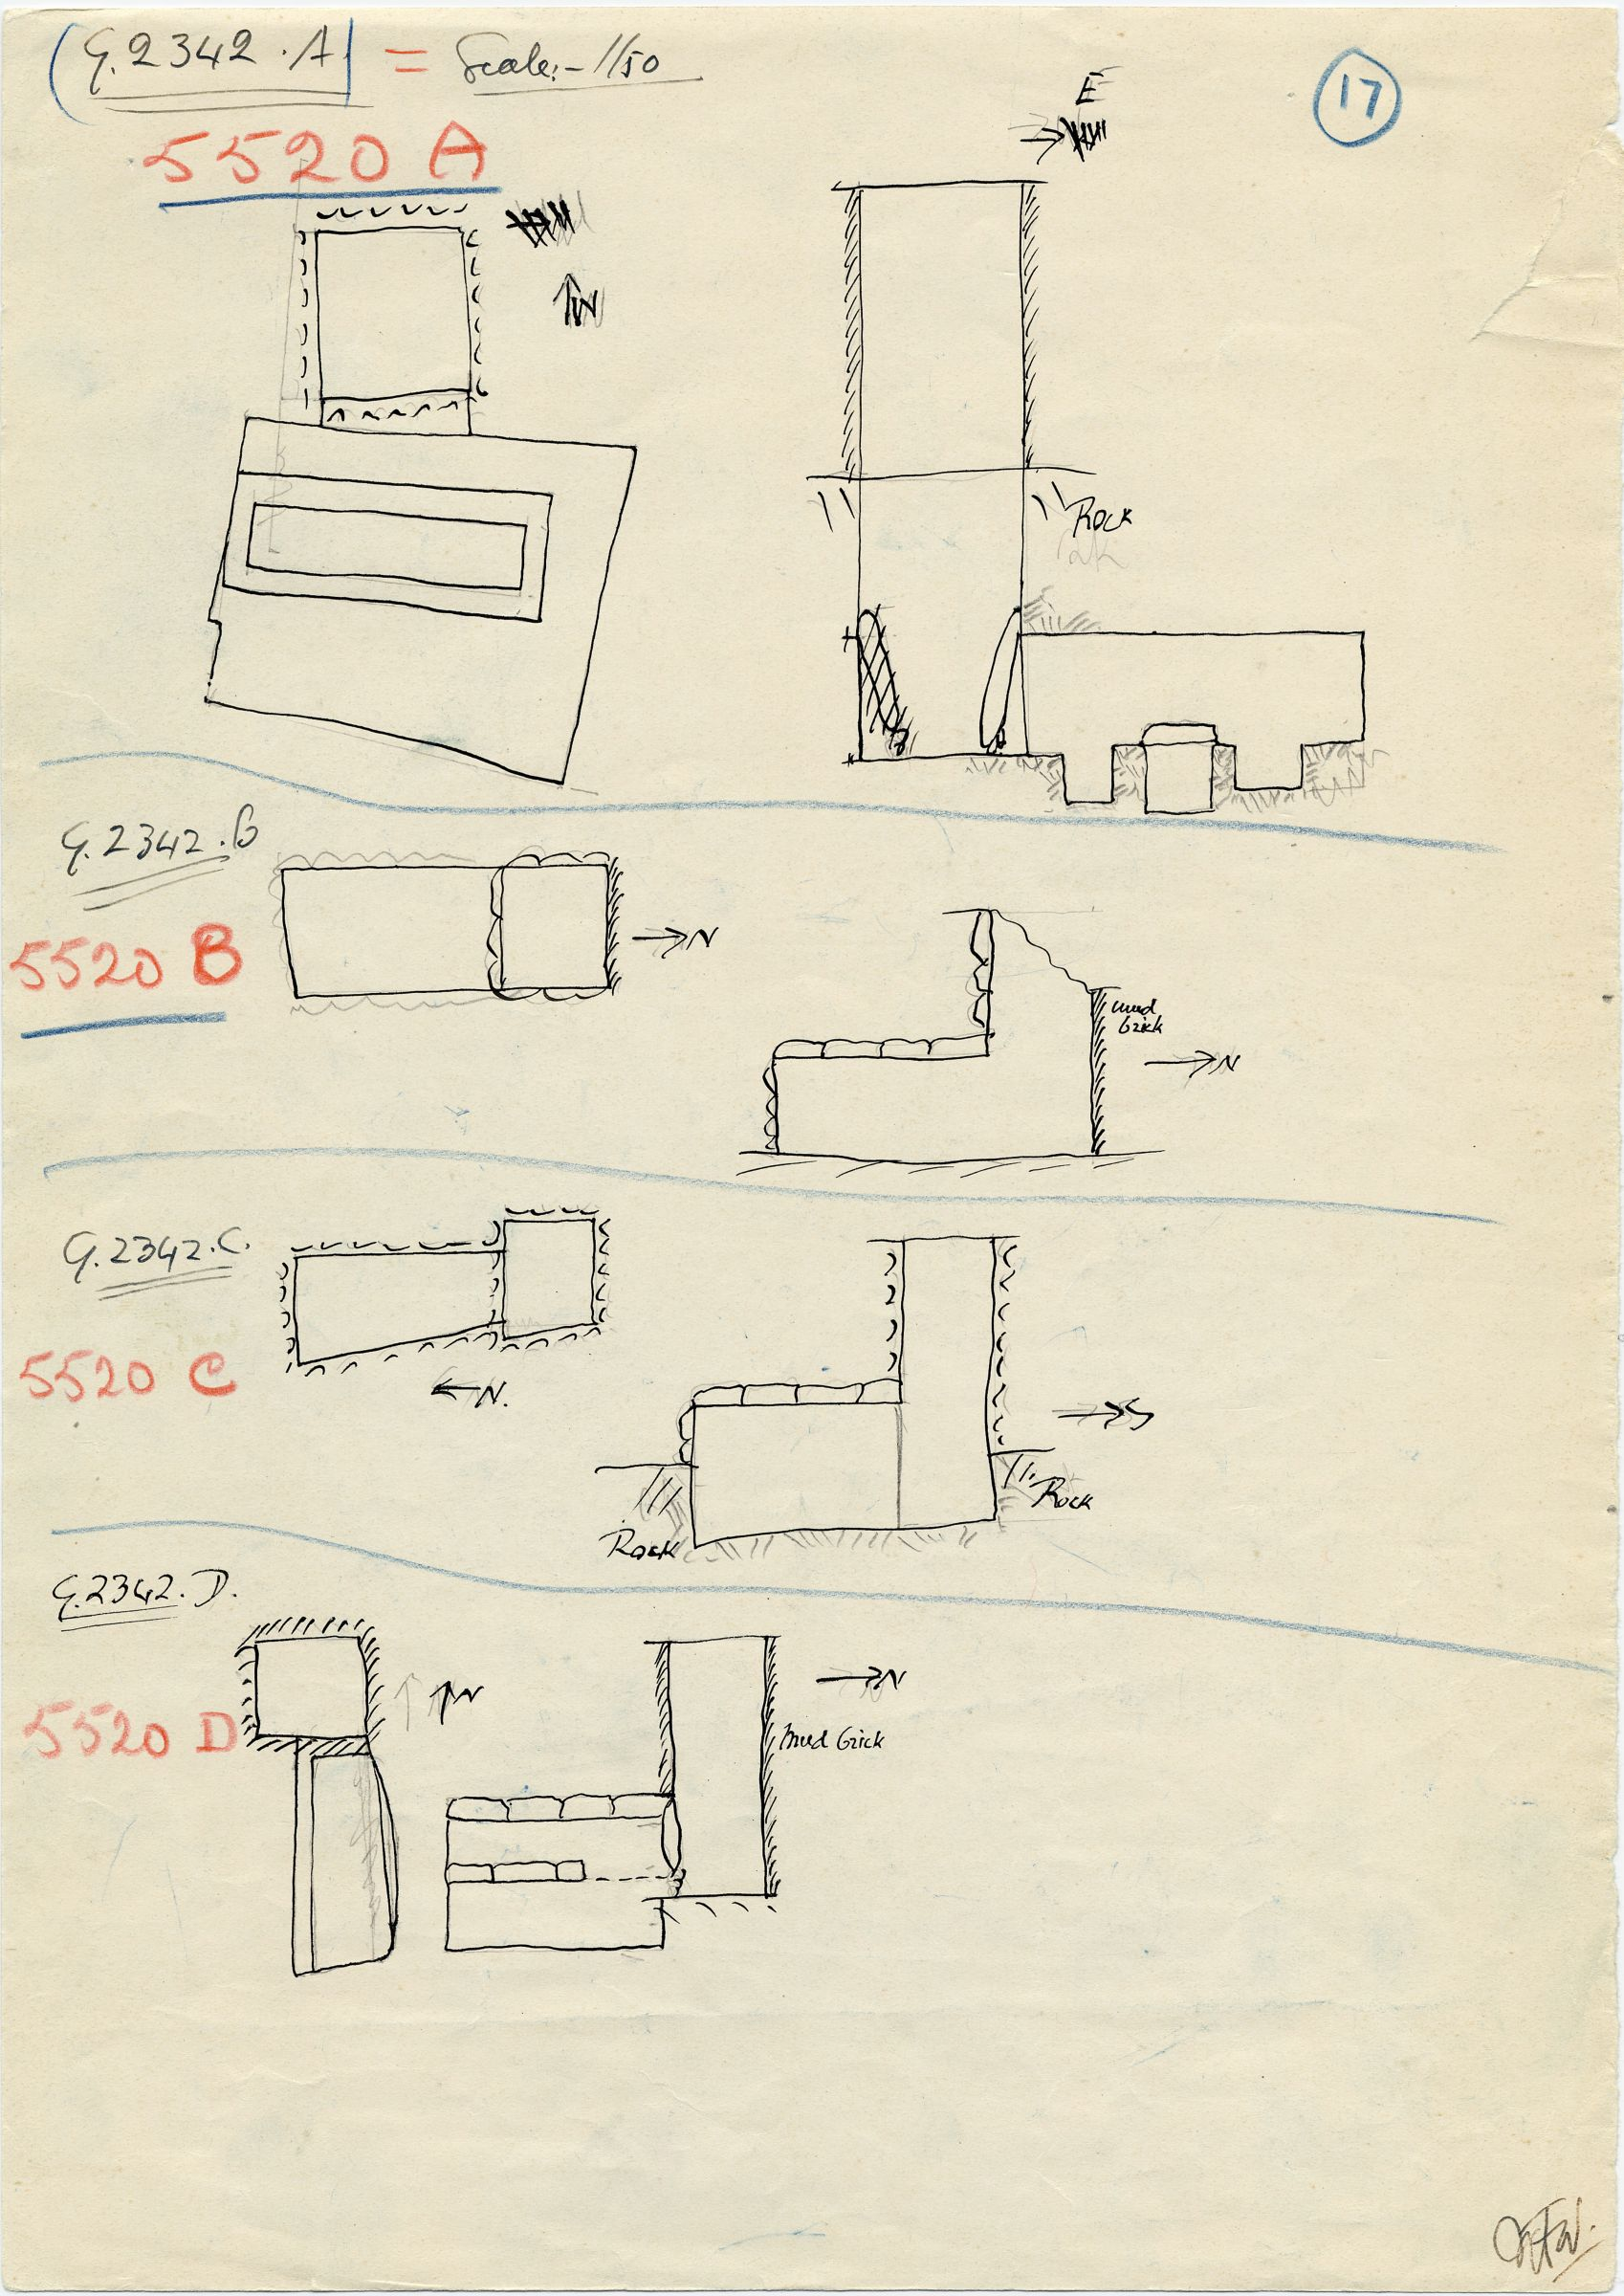 Maps and plans: G 2342 A, B, C, D = G 5520, Shaft A, B, C, D